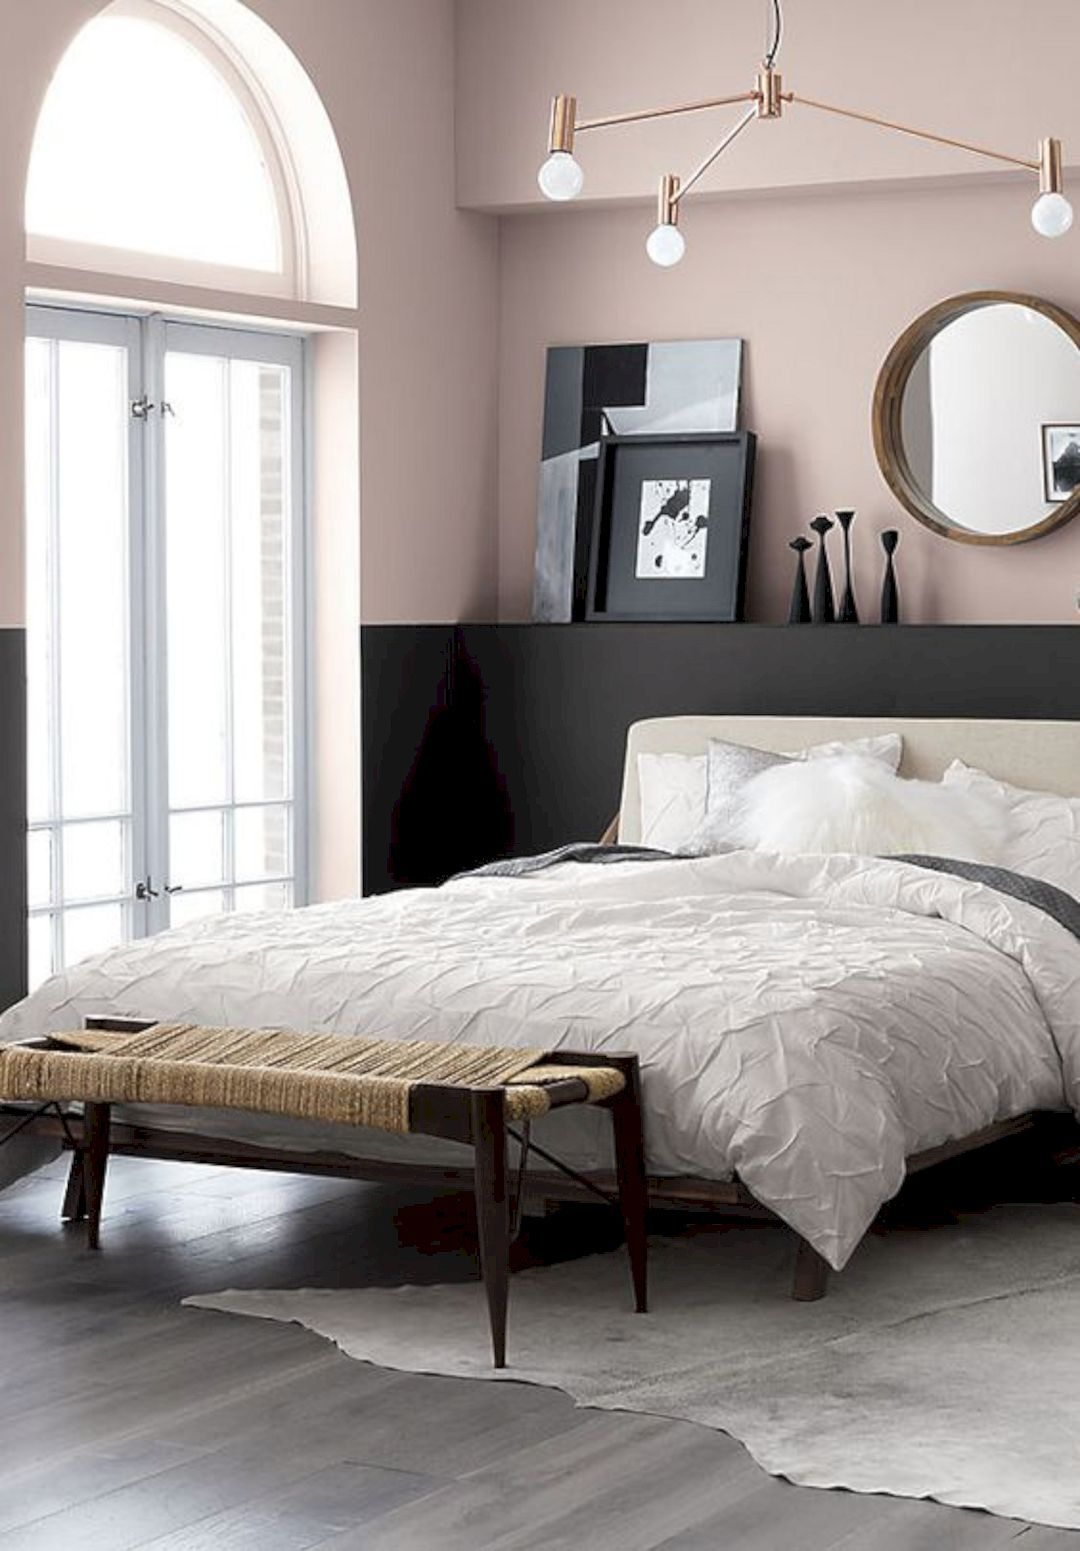 16 Awesome Black Furniture Bedroom Ideas | Bedroom ...